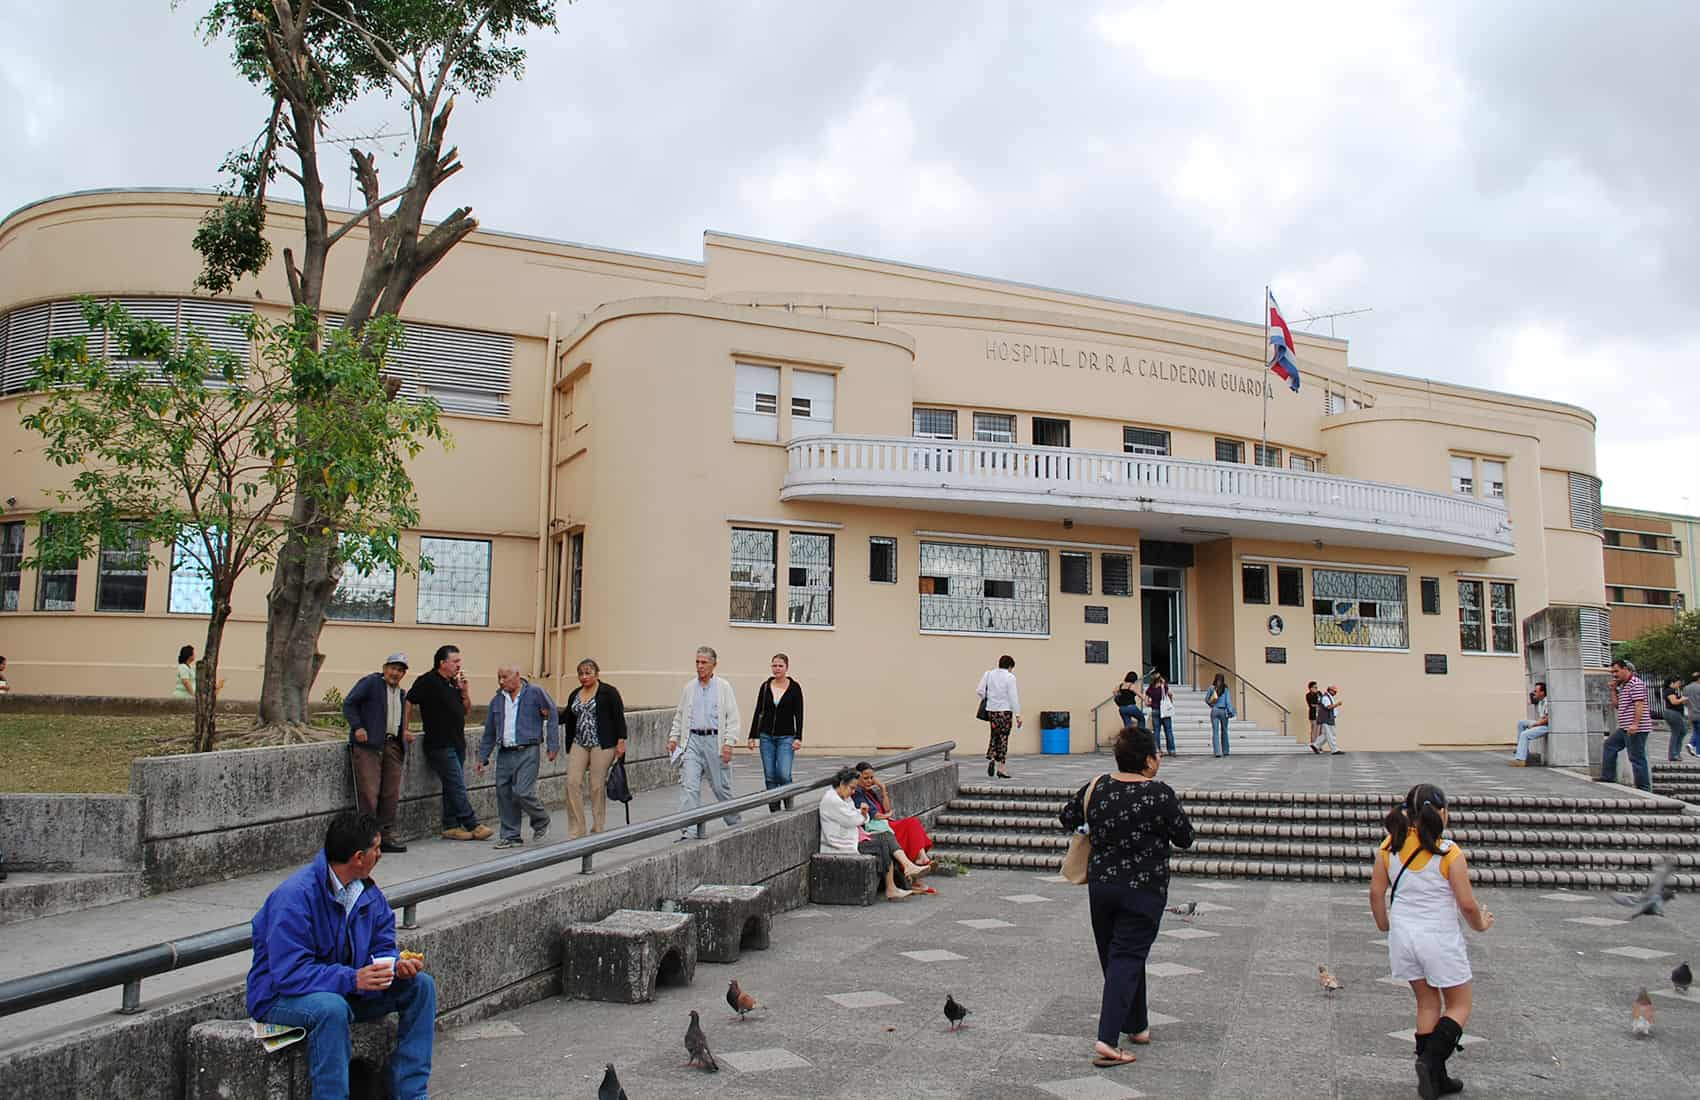 Calderón Guardia Hospital